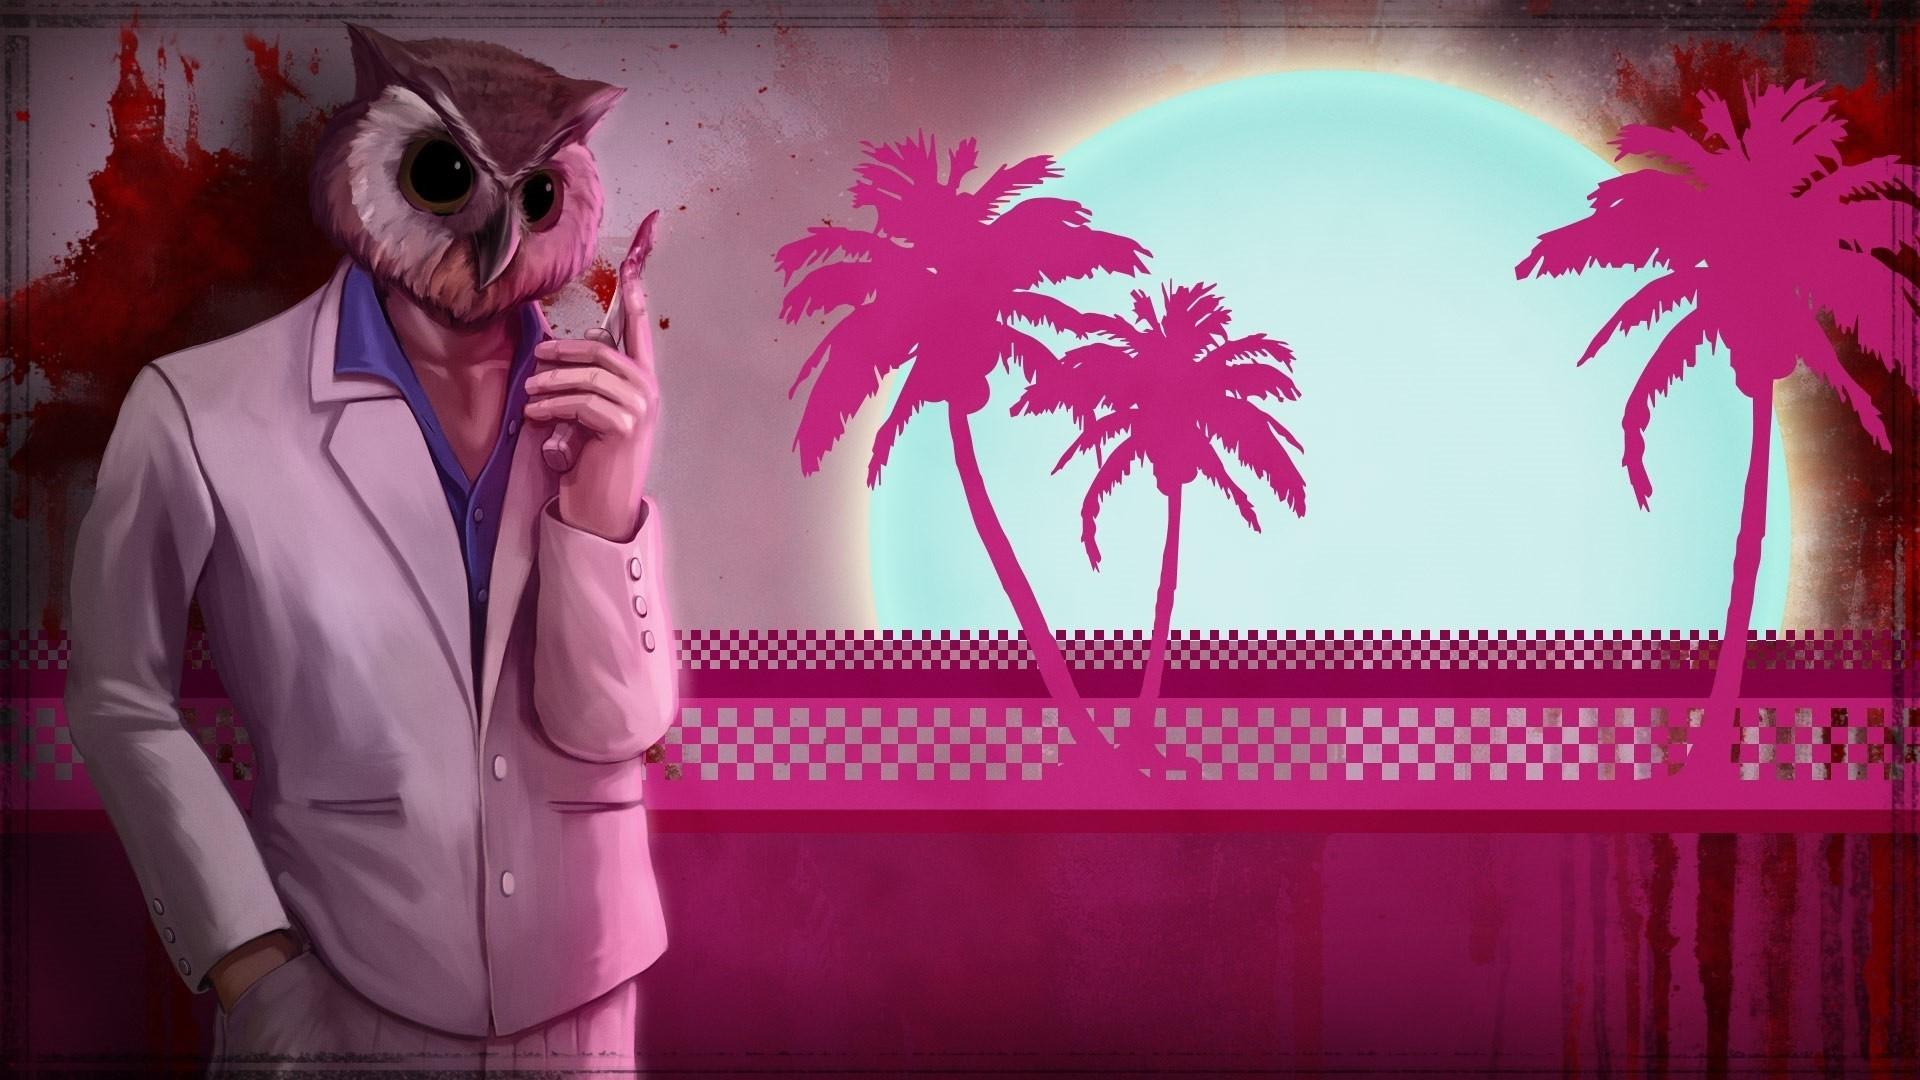 Hotline Miami computer wallpaper